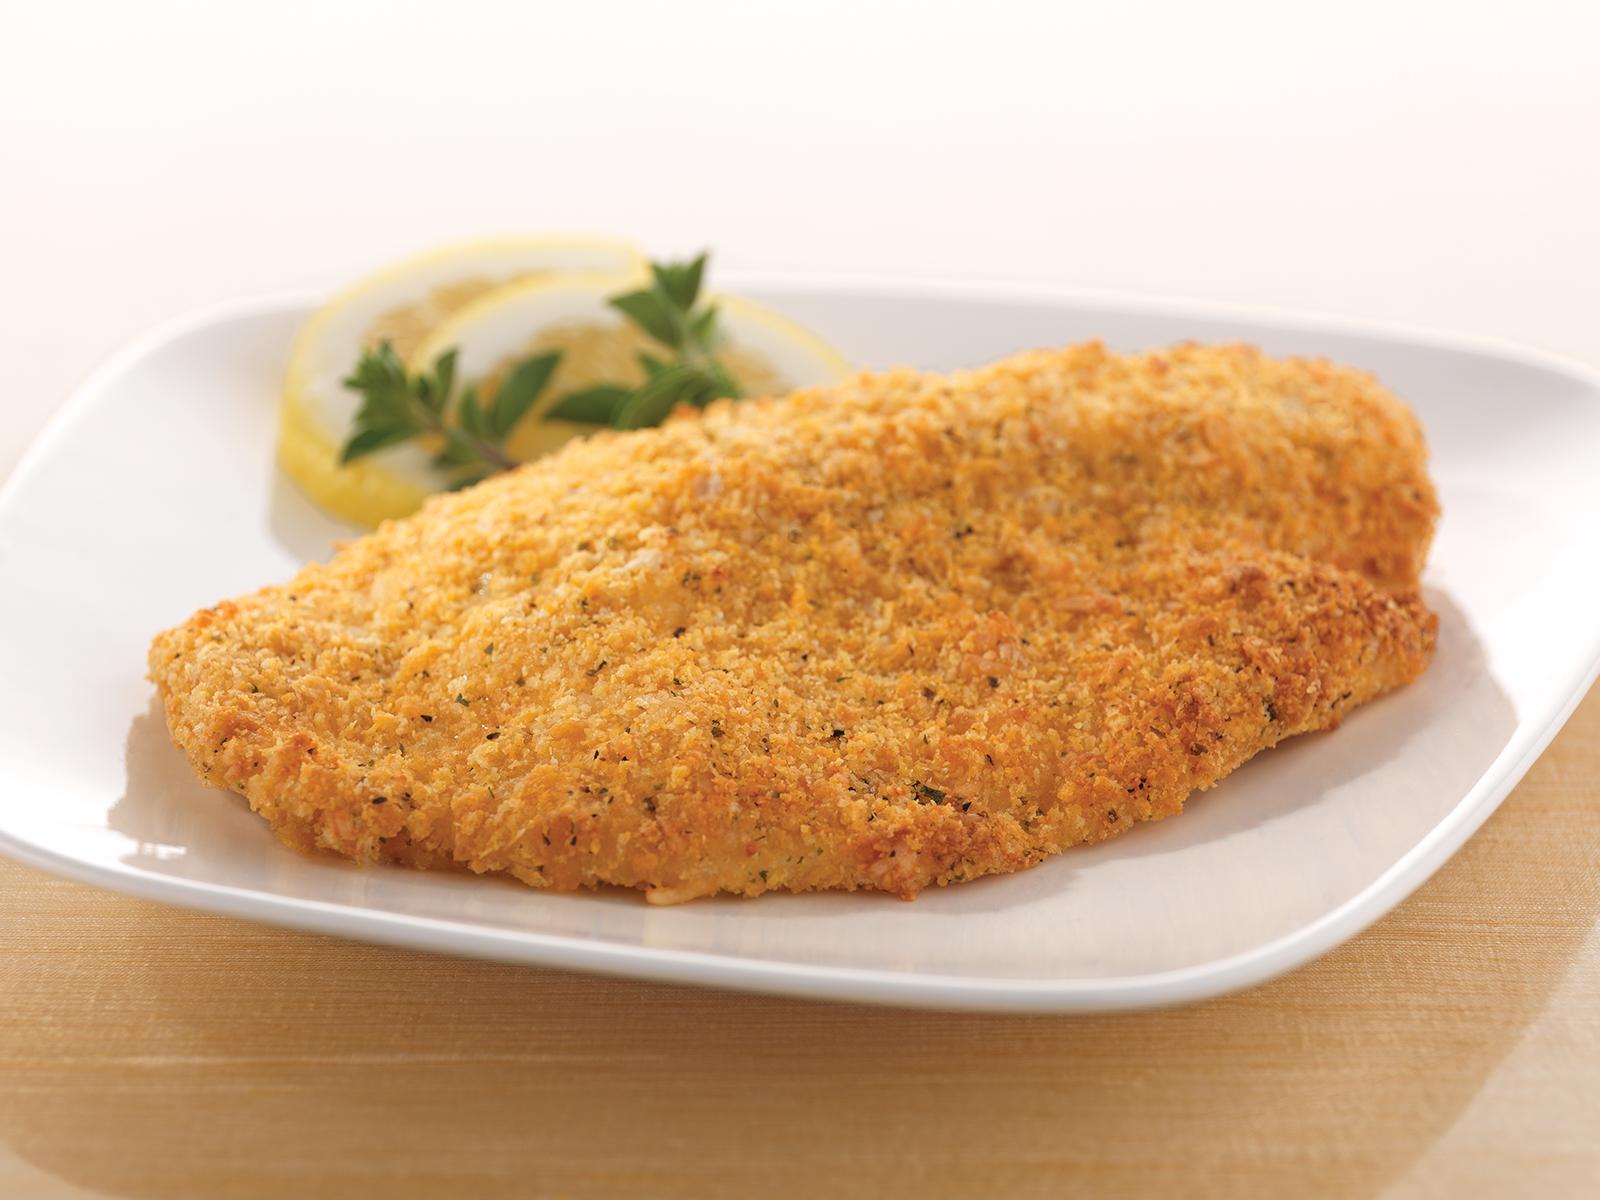 Parmesan Encrusted Tilapia 5 oz (1/10 lb) 417492